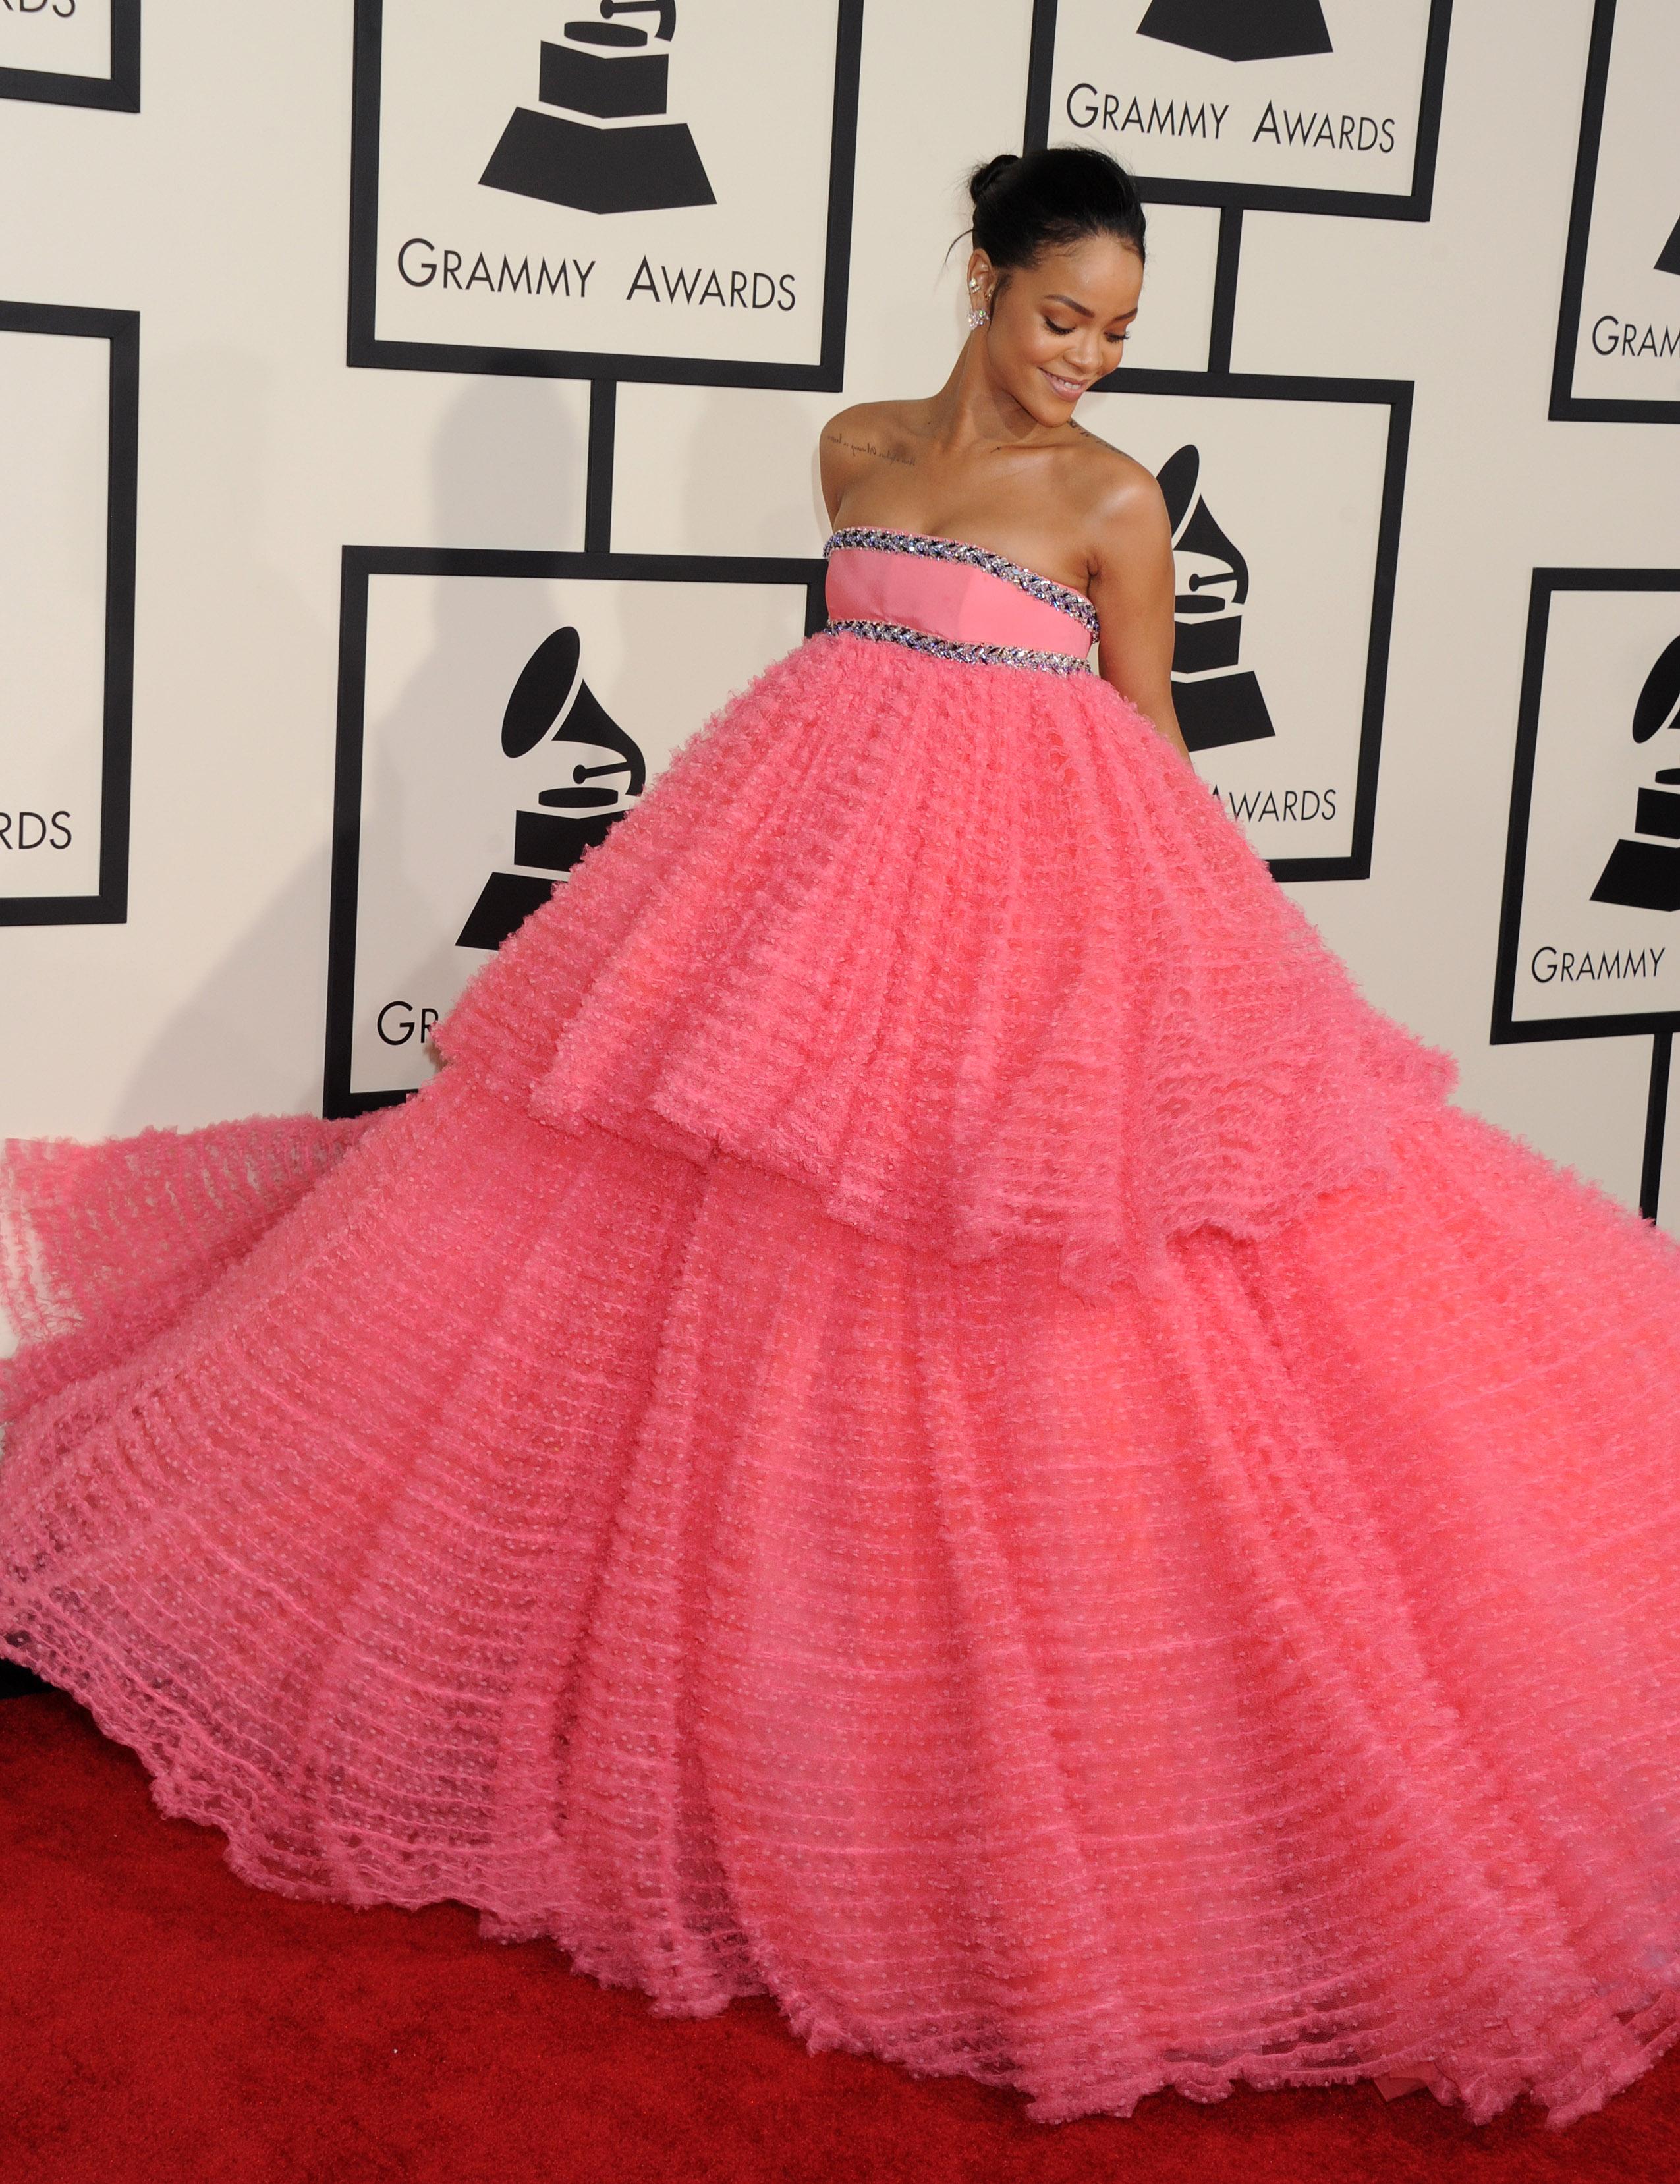 Rihanna at the Grammy Awards, 2015. Photo by Broadimage/REX/Shutterstock